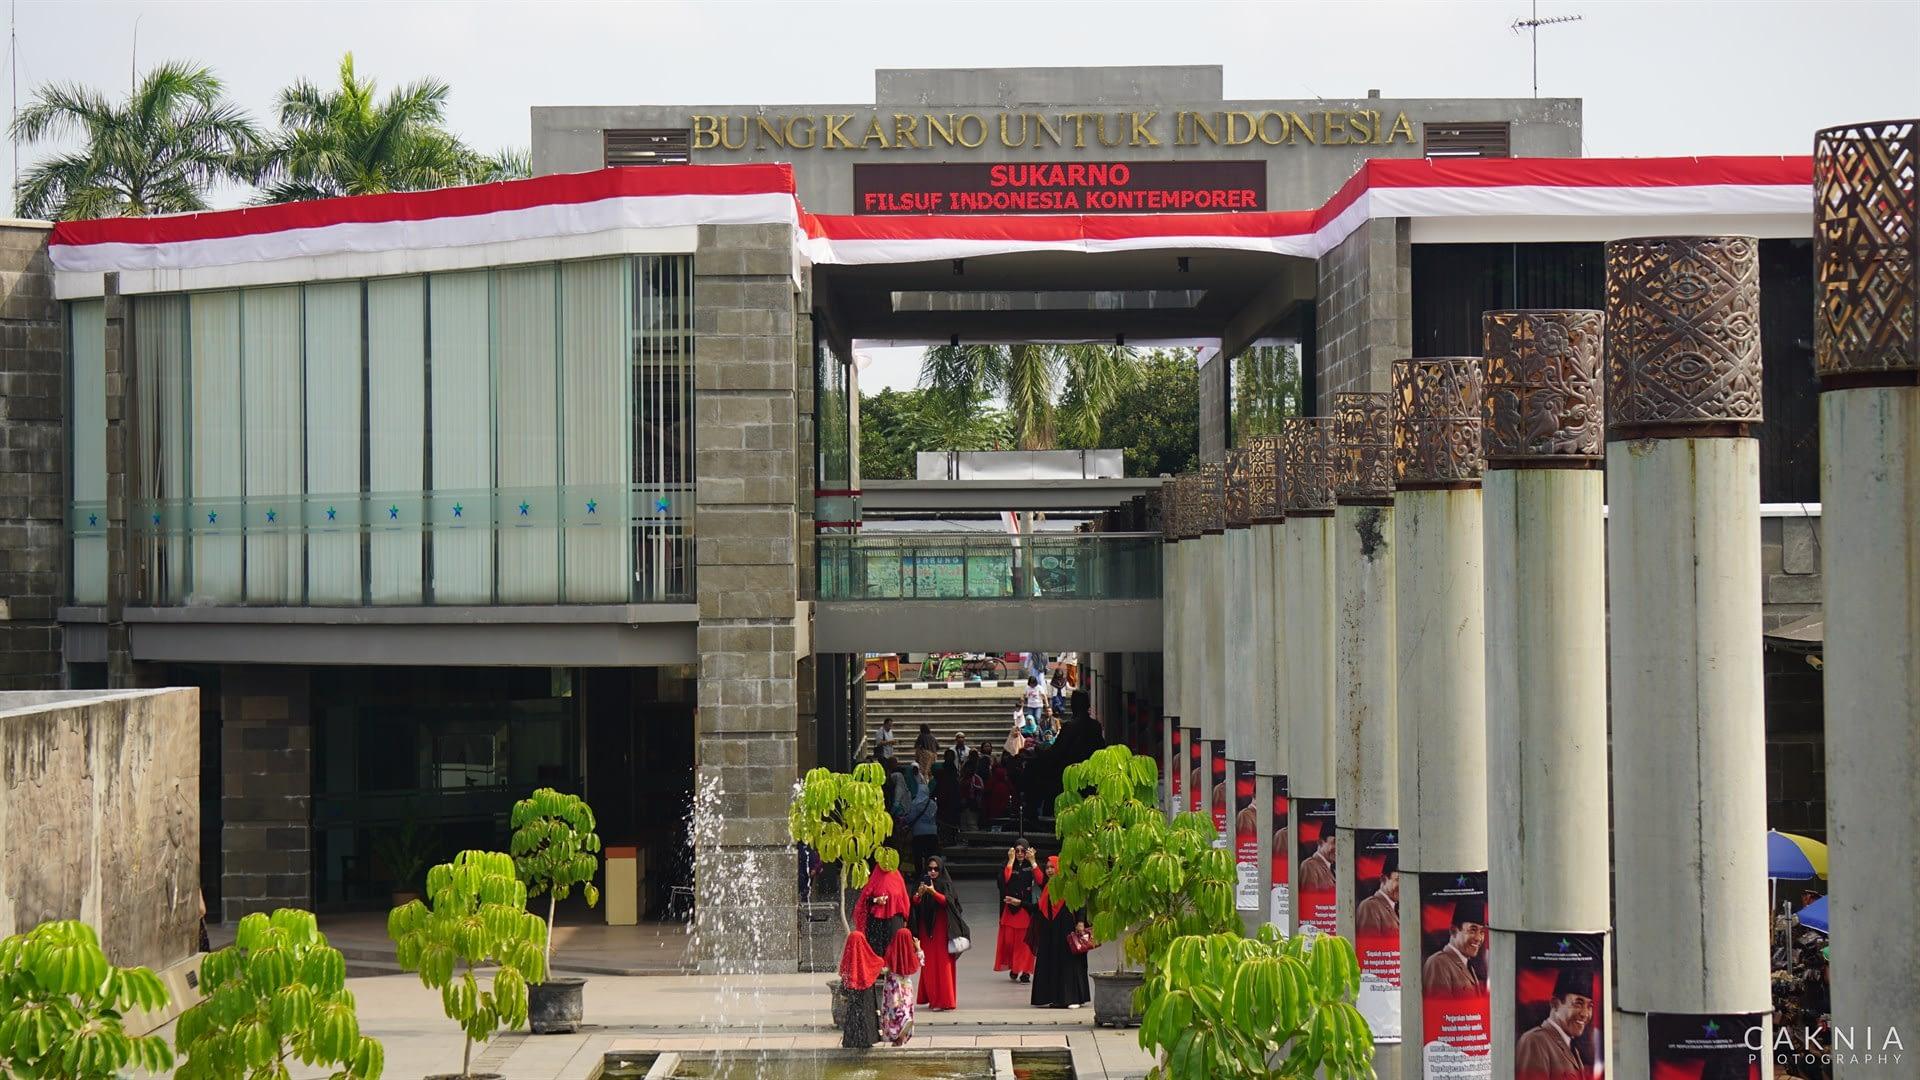 Museum Bung Karno